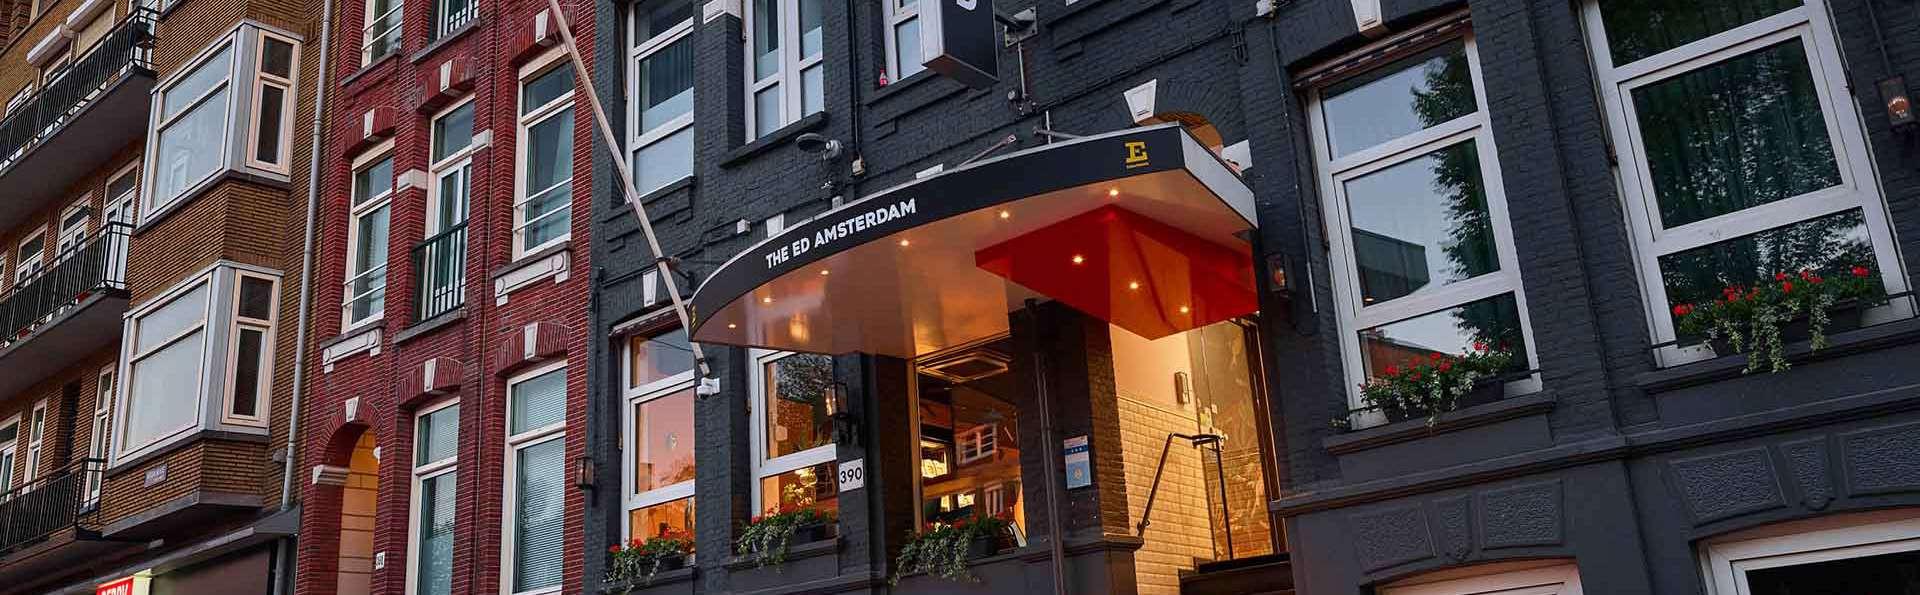 The ED Amsterdam - EDIT_EH_-_THE_ED_HOTEL_AMSTERDAM_-_EXTERIEUR_01.jpg